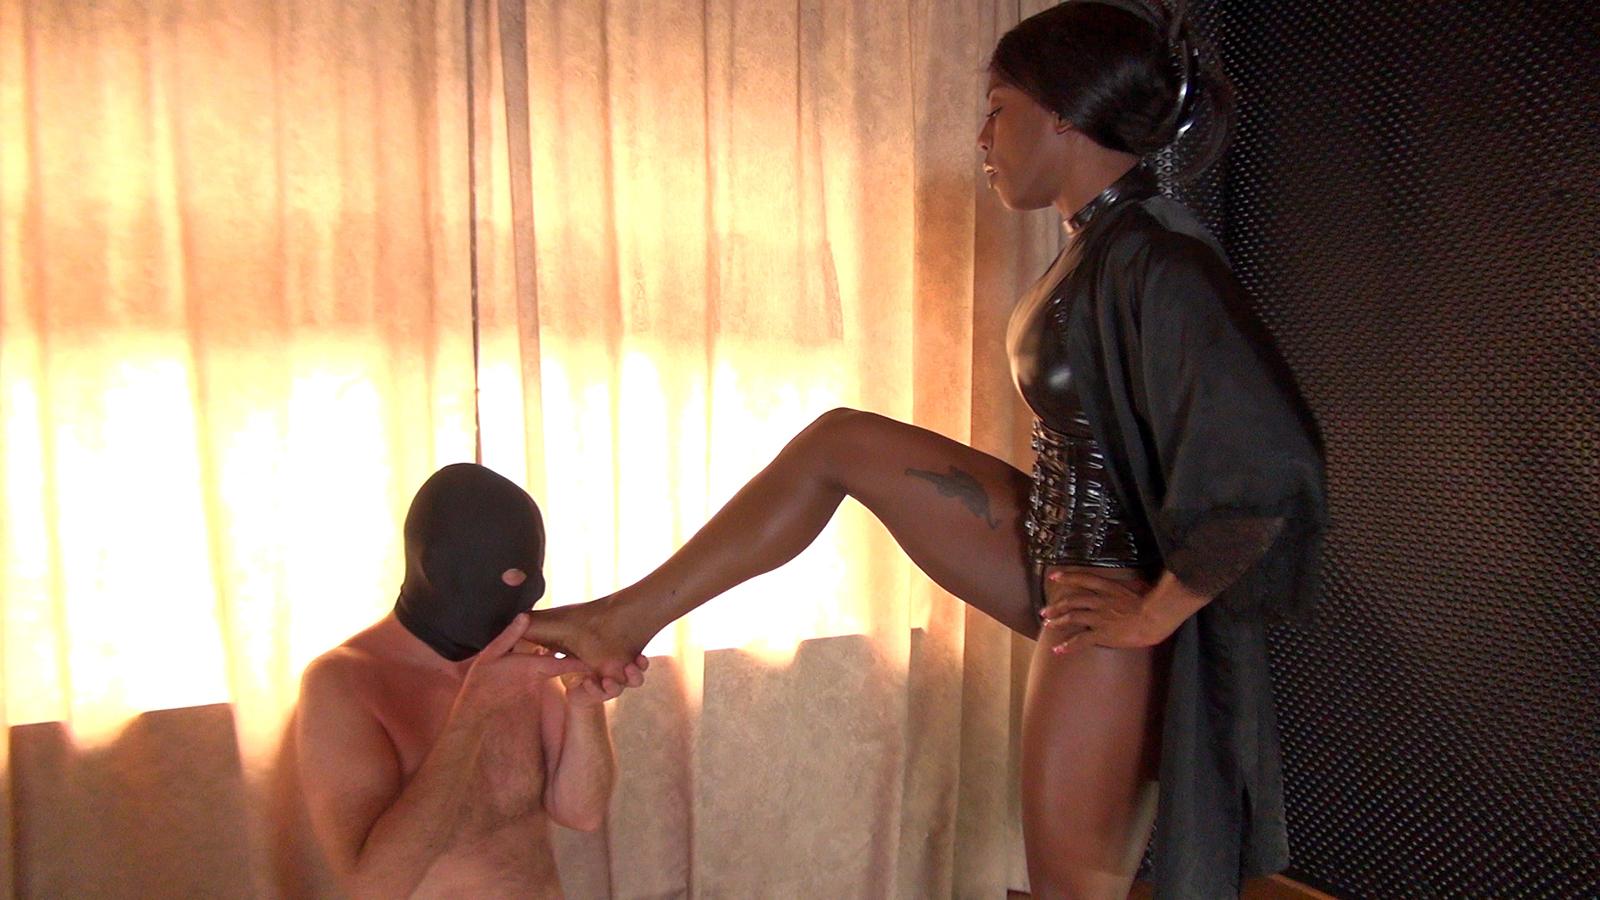 【SMエロ画像】跪きなさい…セクシー女王様によるありがたいお仕置きの数々www 15